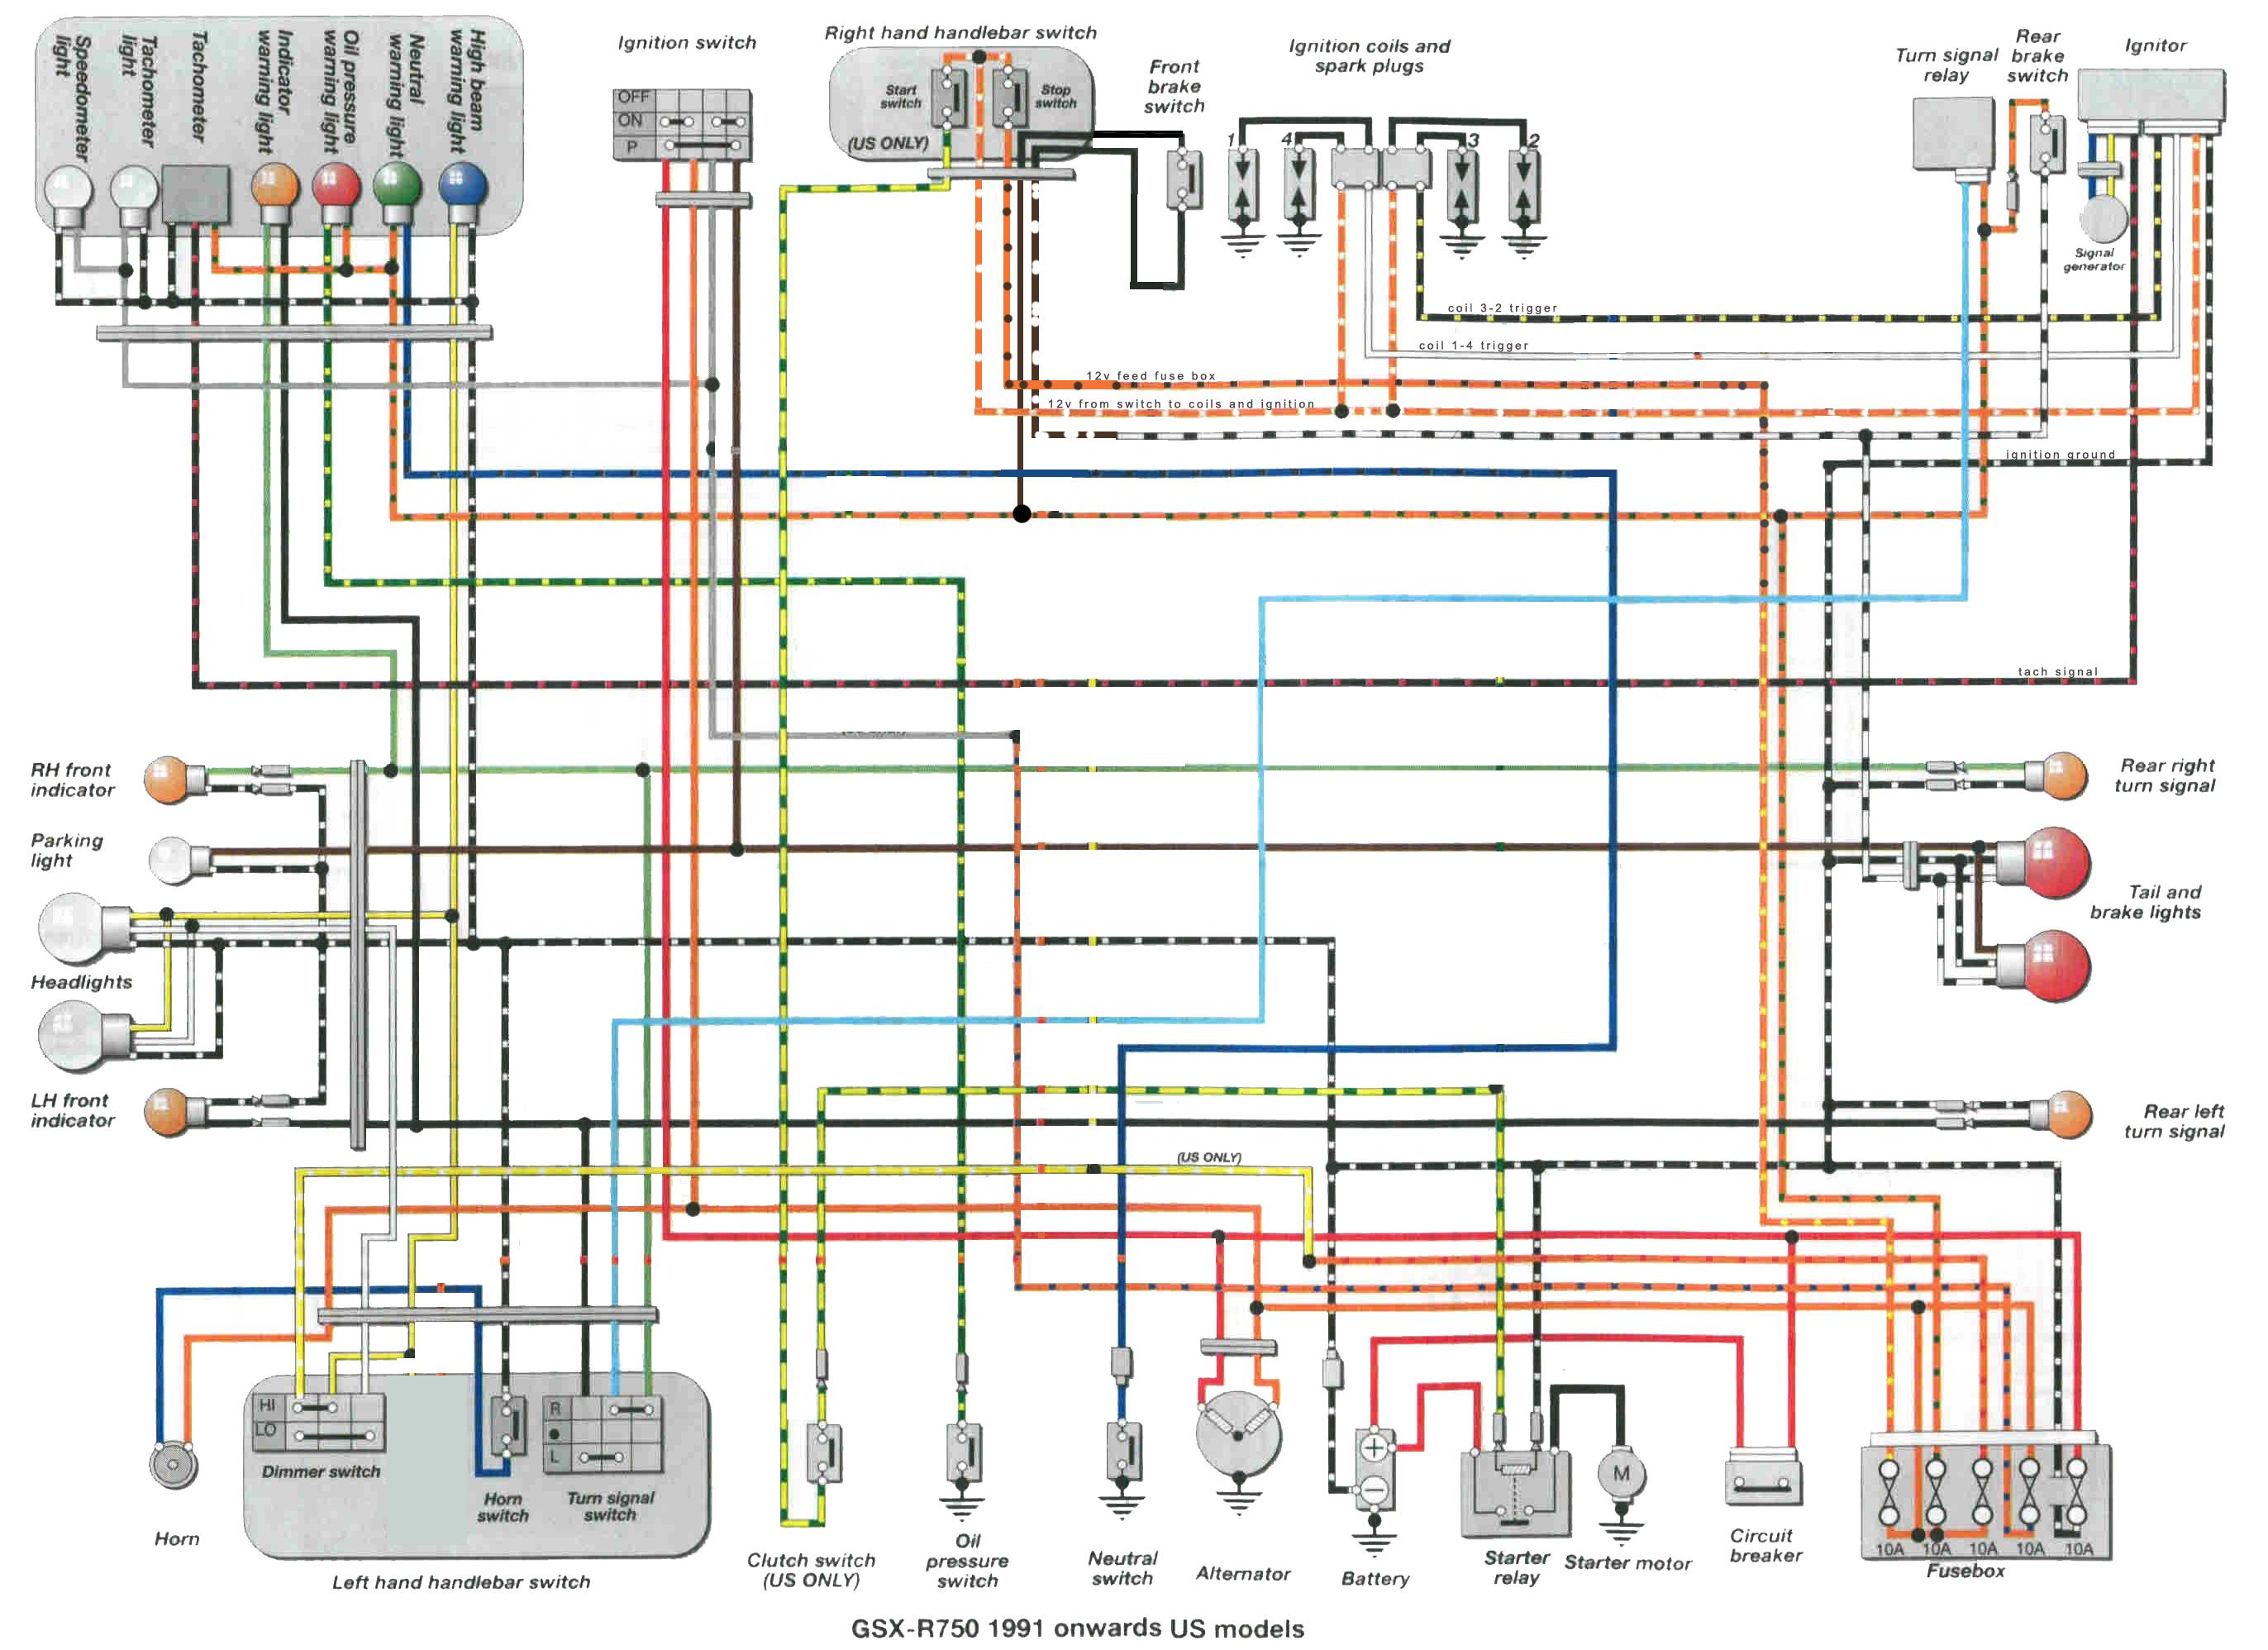 91 gsxr 750 wiring diagram sv1000 wiring diagram wiring diagram LT John Deere 750C  John Deere Four Wheelers Deere 750C Dozer JD 750C